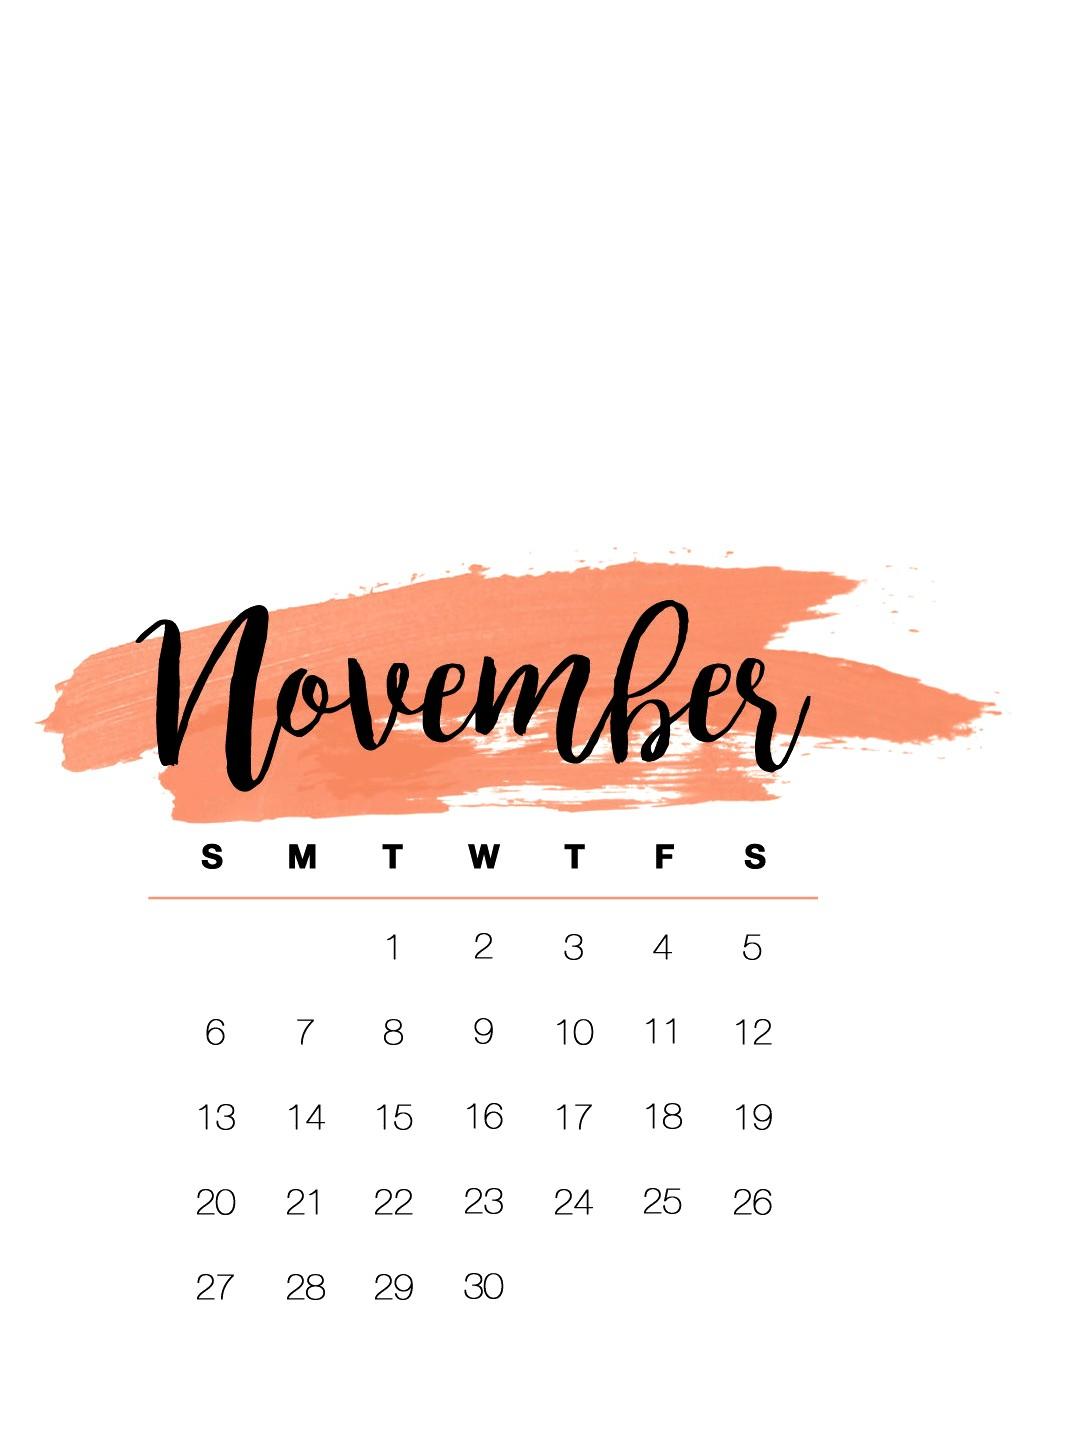 Cute November 2019 Calendar For iphone